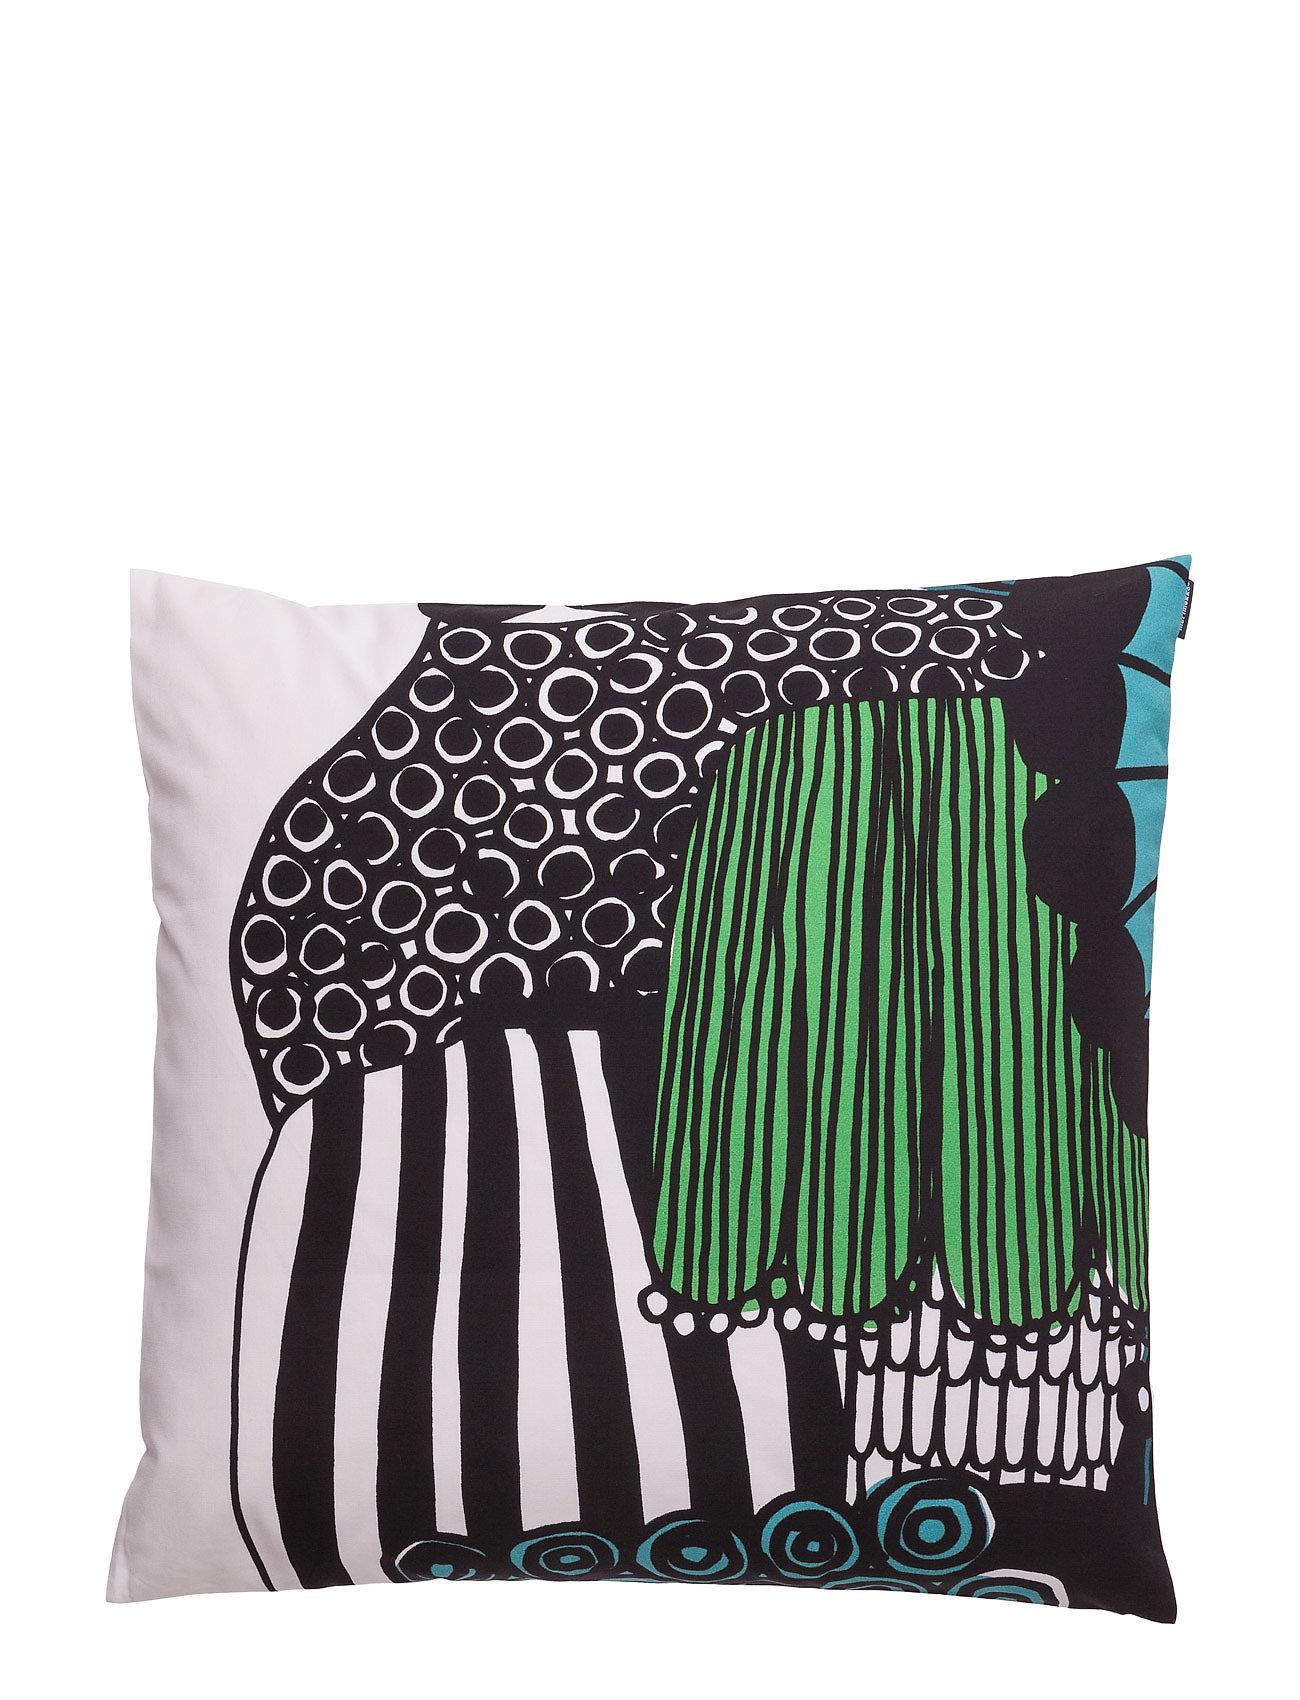 Cushion greenMarimekko Siirtolapuutarha Home Home Coverwhite Siirtolapuutarha greenMarimekko Coverwhite Cushion 0kOXw8nP